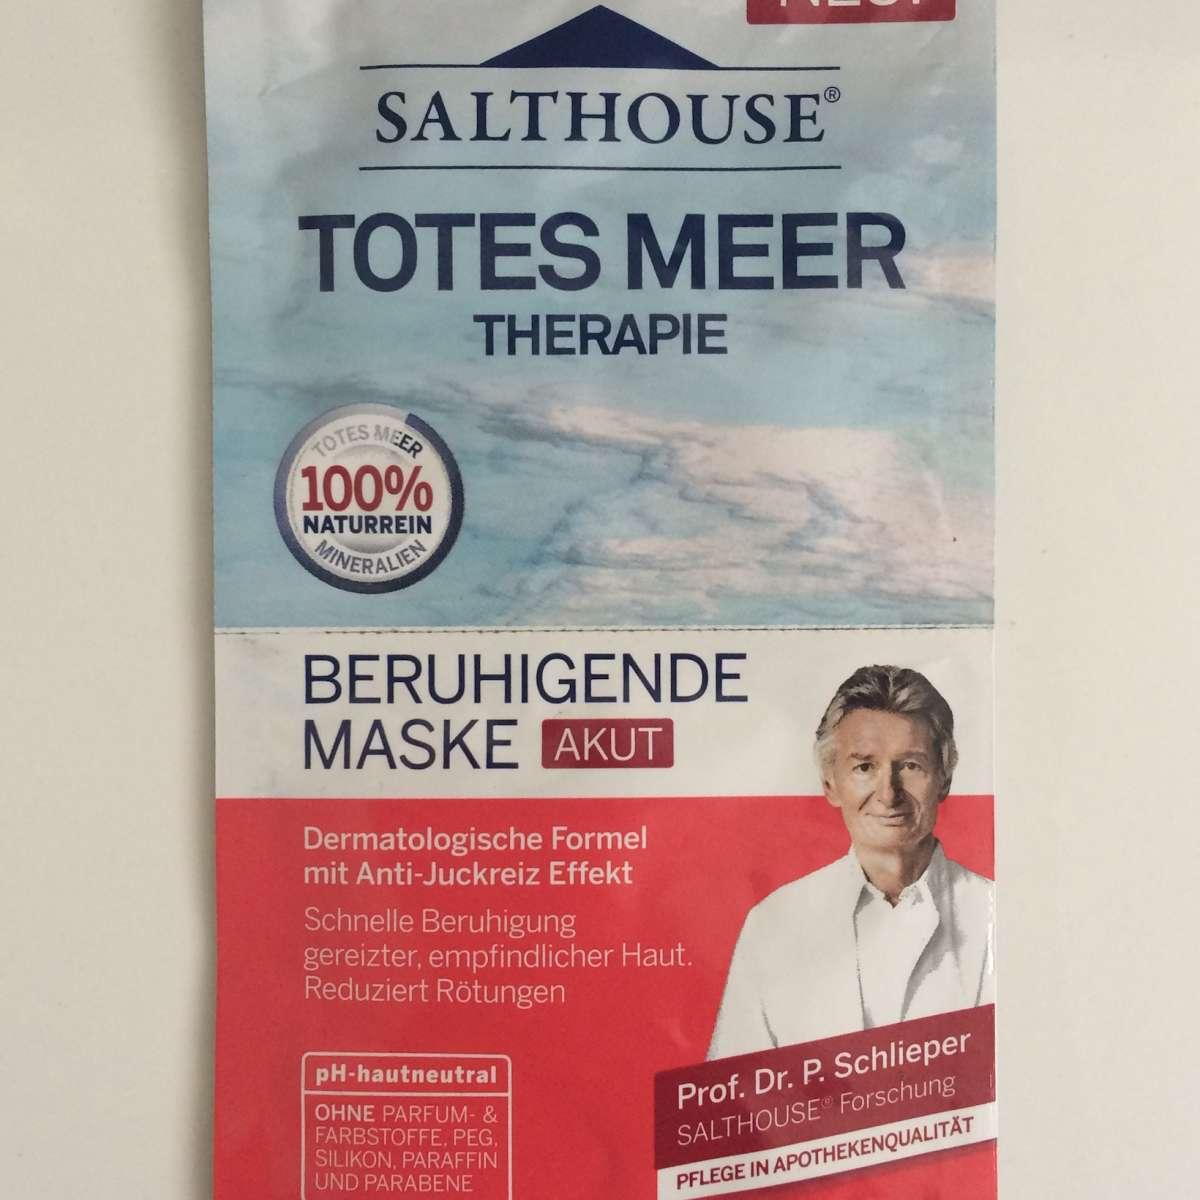 Test Maske Salthouse Totes Meer Therapie Beruhigende Maske Akut